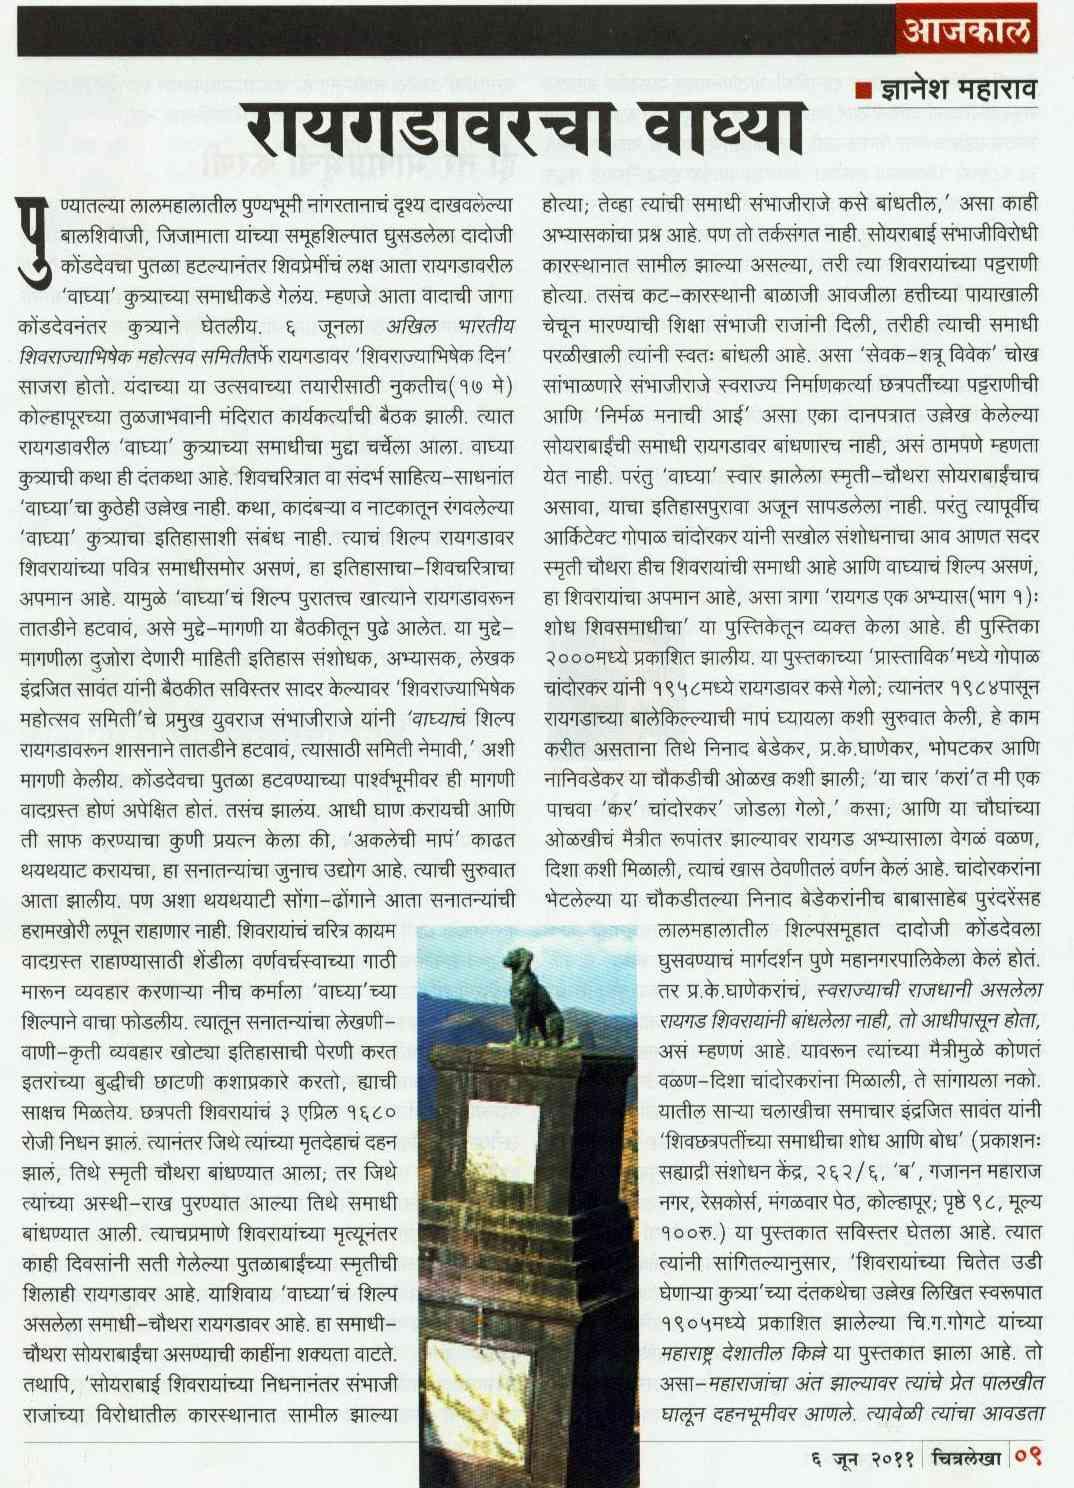 Raigad Waghya Statue Part 1